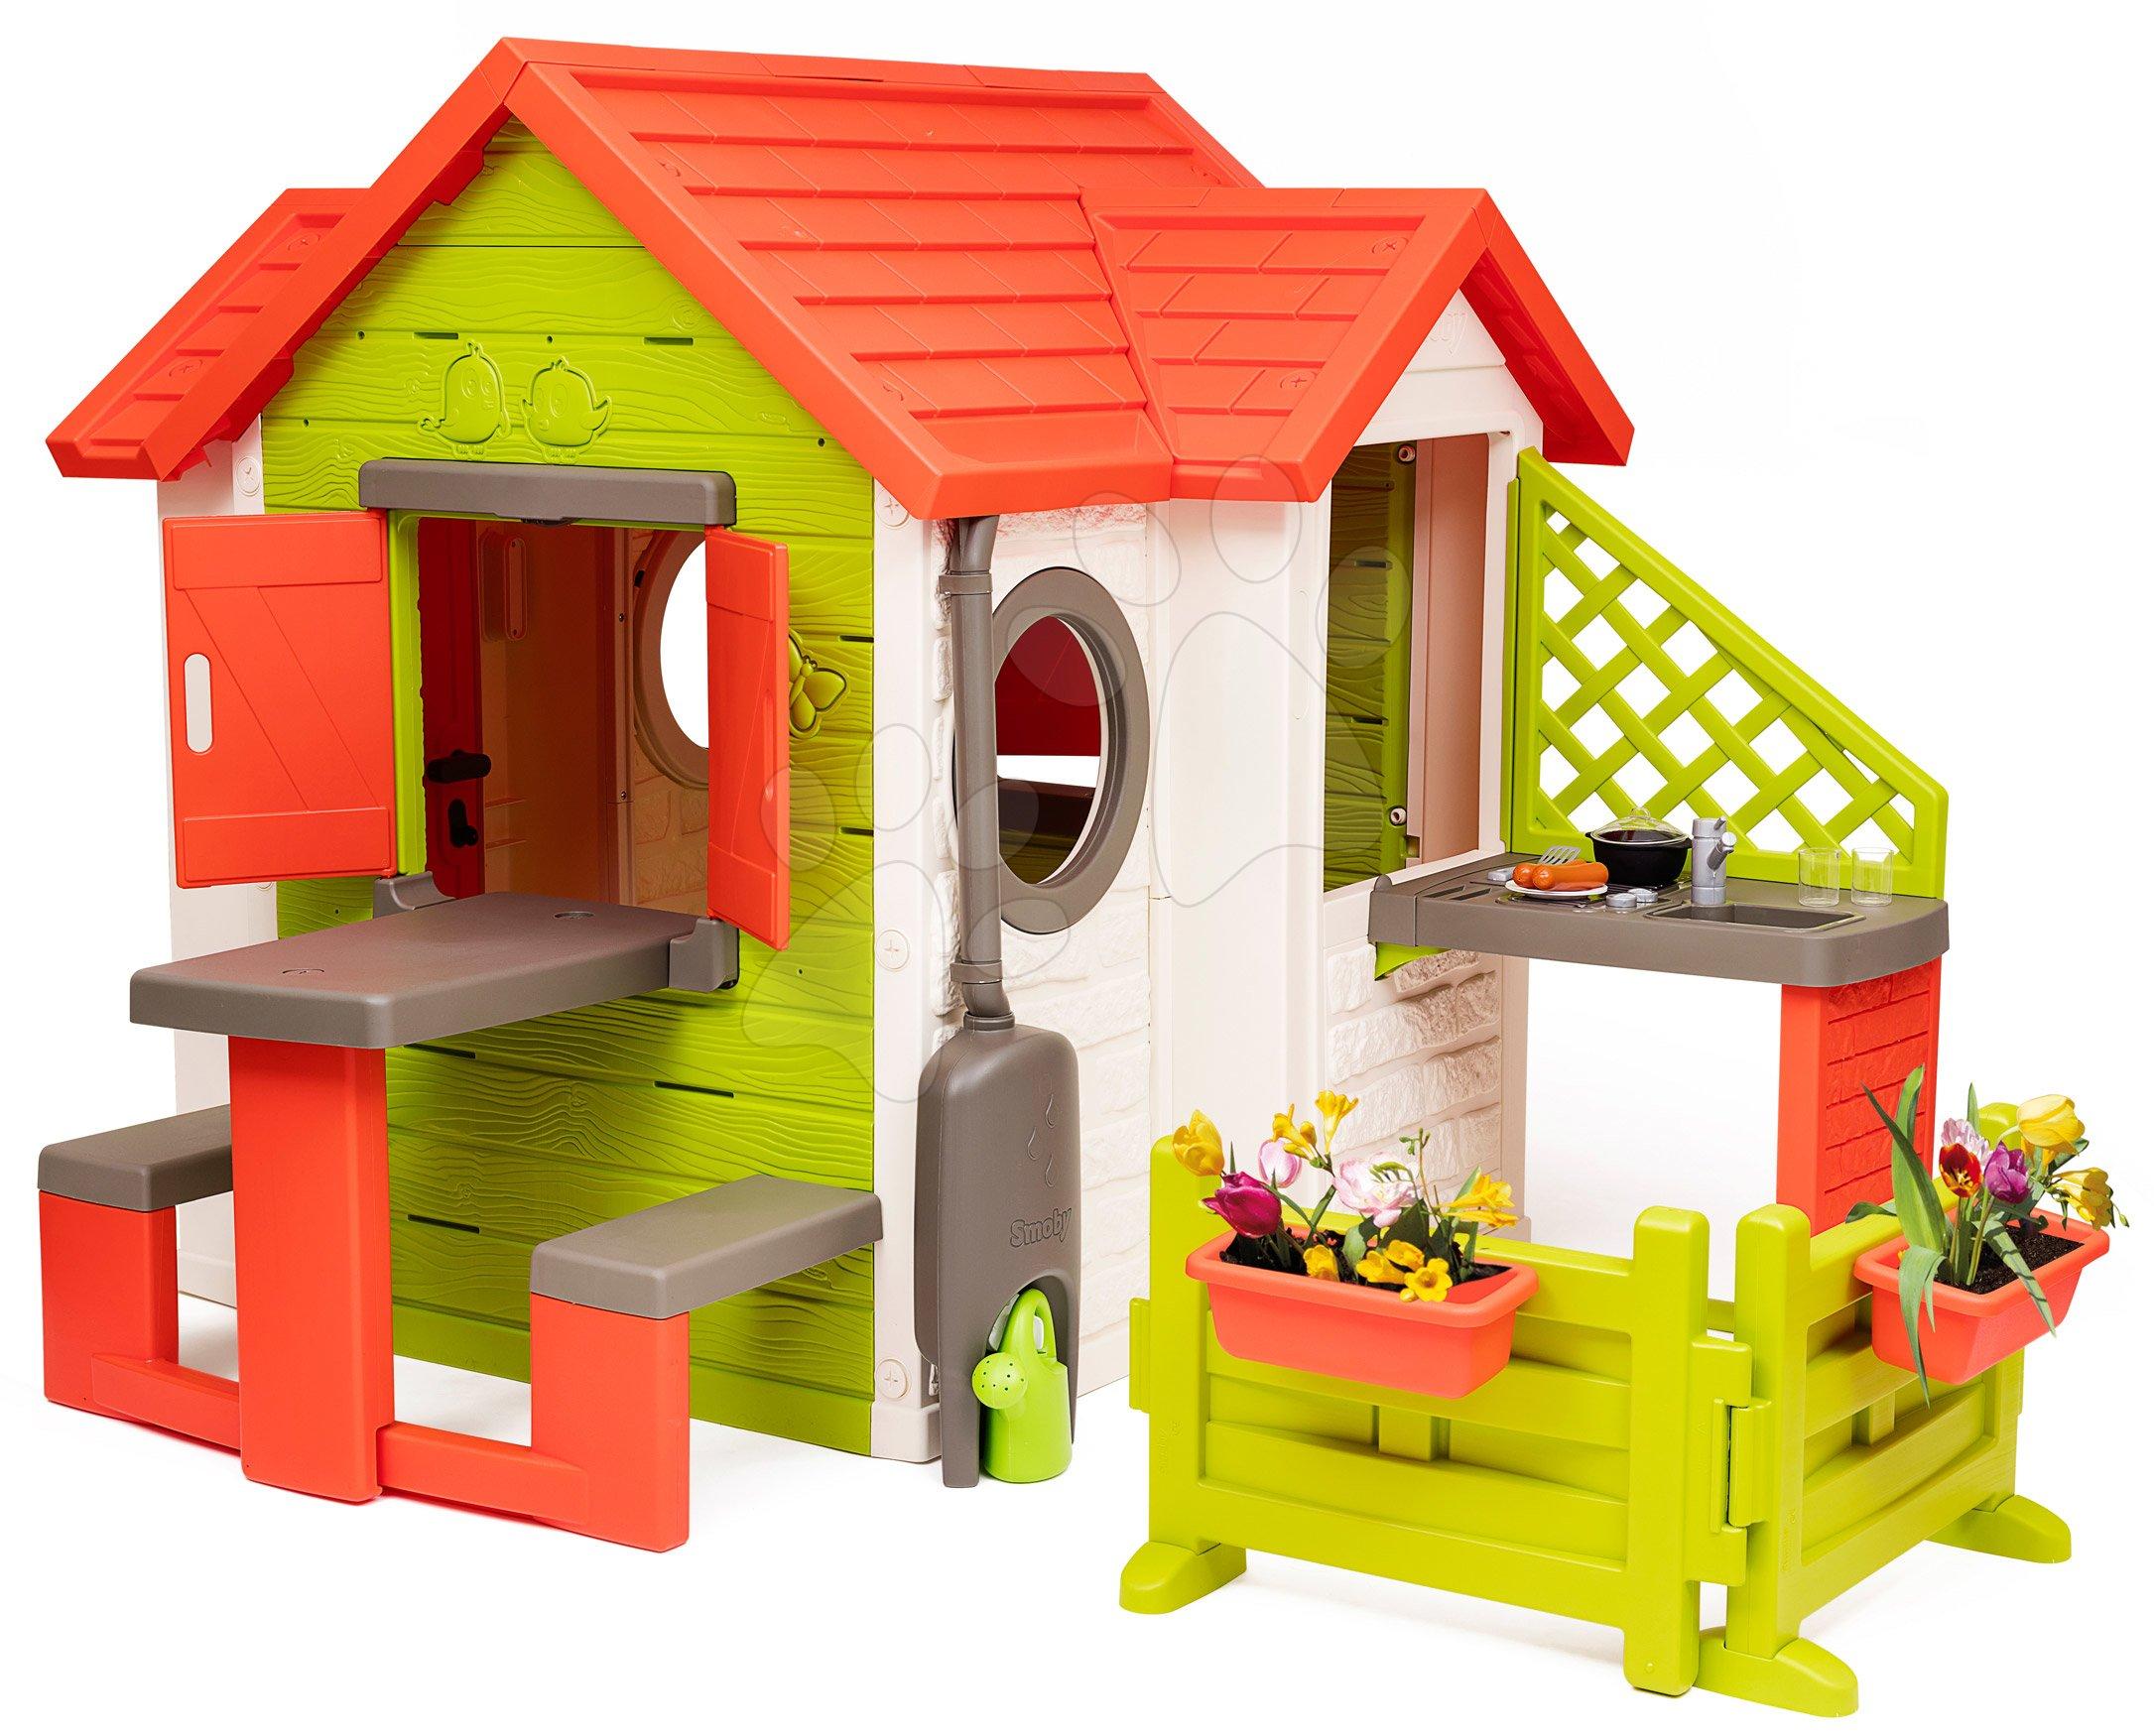 Căsuță My Neo House DeLuxe Smoby variantă extinsă